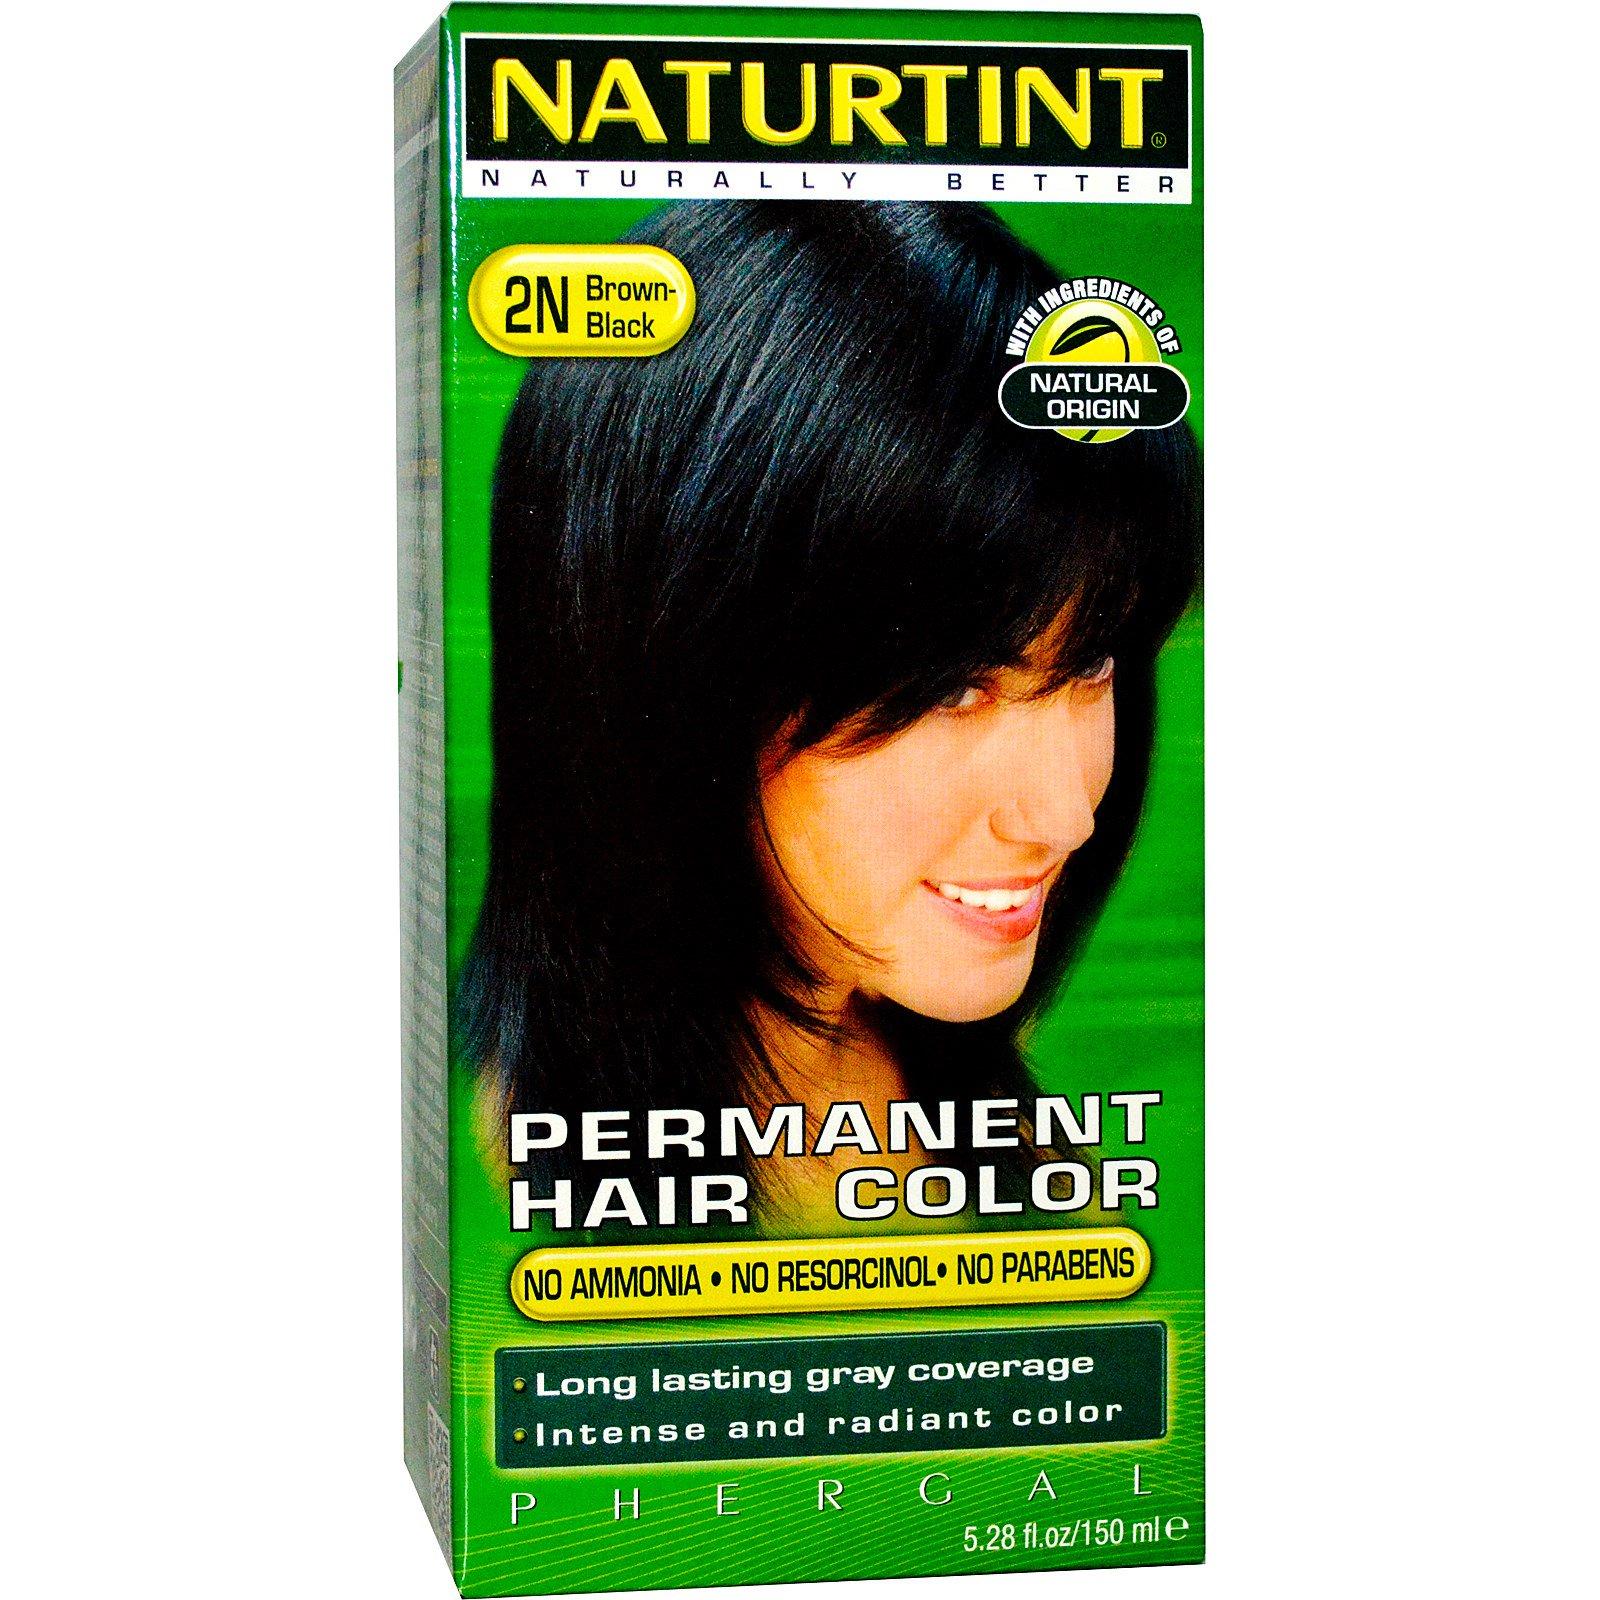 Naturtint Permanent Hair Color 2n Brown Black 528 Fl Ozpack Of